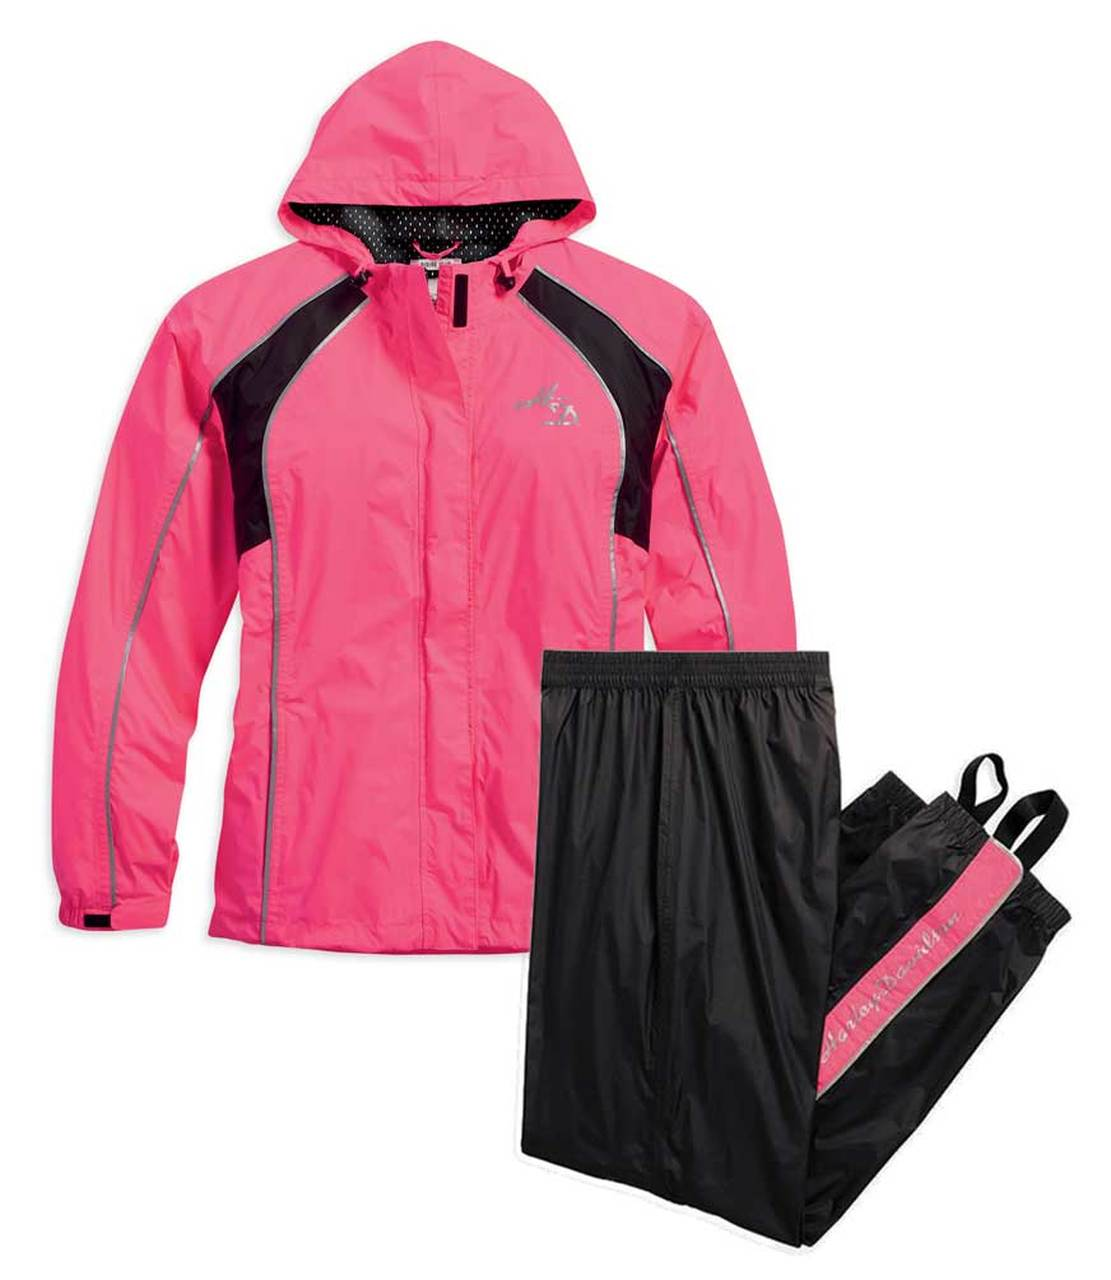 Harley-Davidson® Women's Hi-Vis Reflective Rain Suit, Pink/Black.